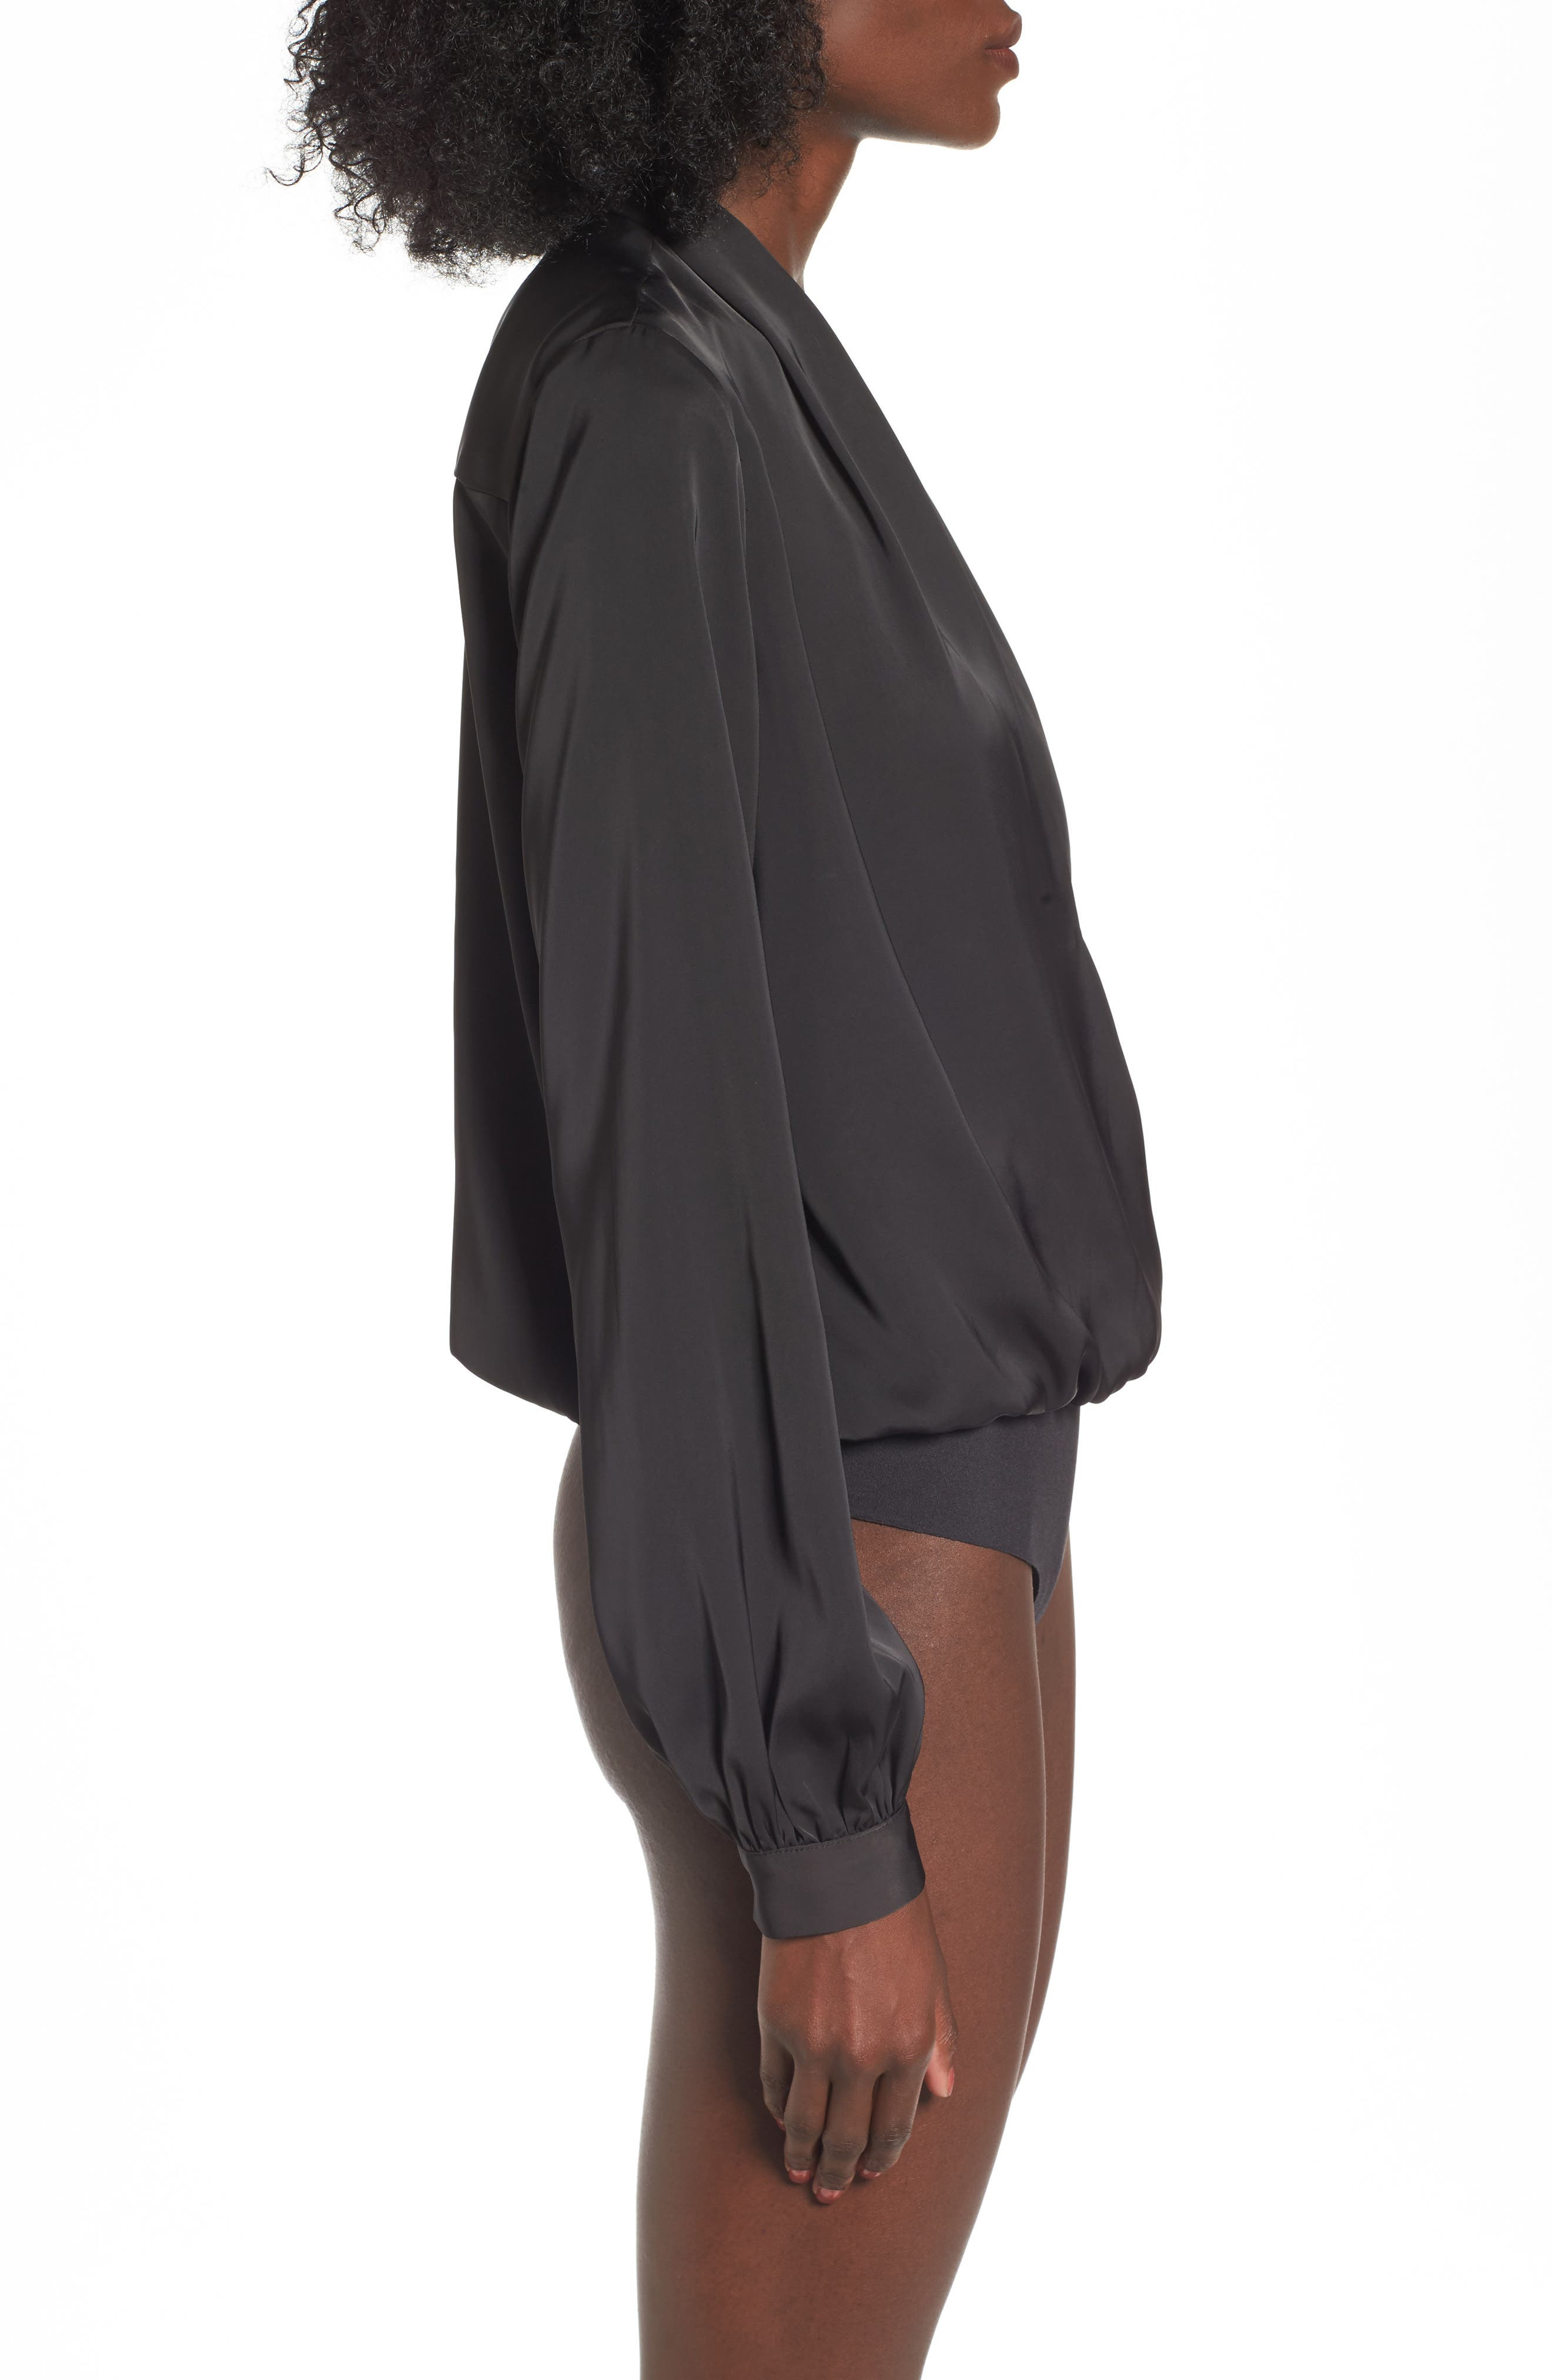 L'Academie The Long Sleeve Bodysuit,                             Alternate thumbnail 3, color,                             Black